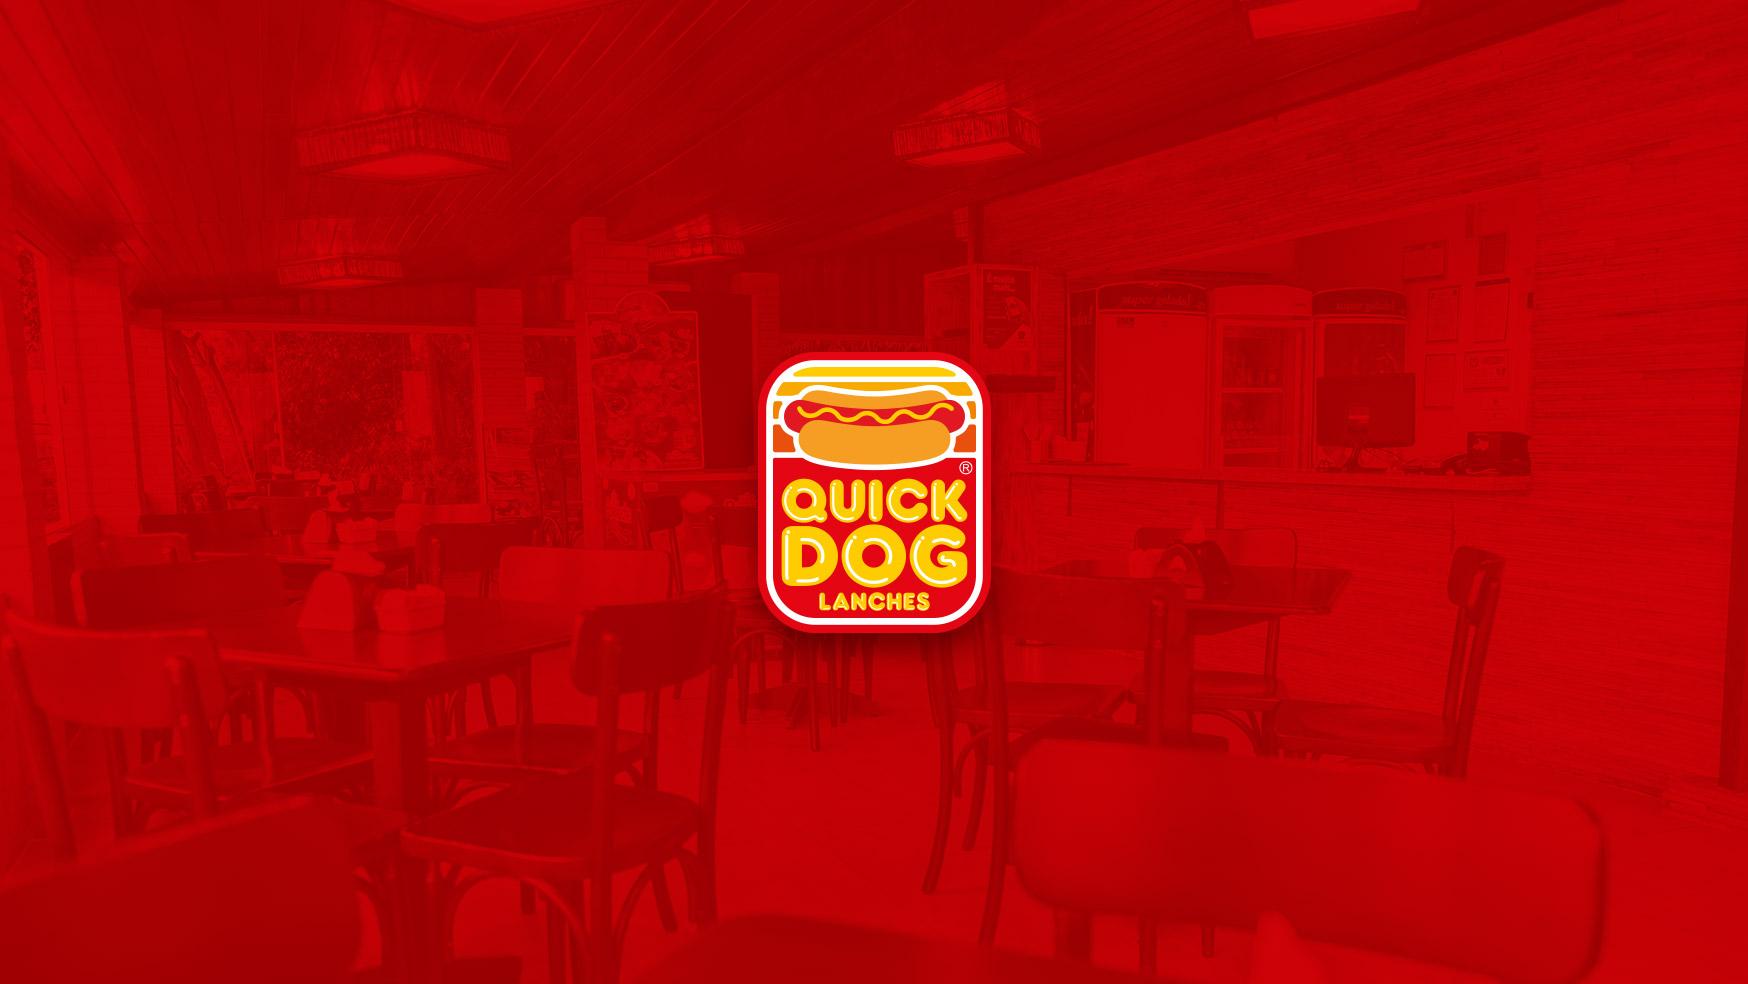 Quick Dog